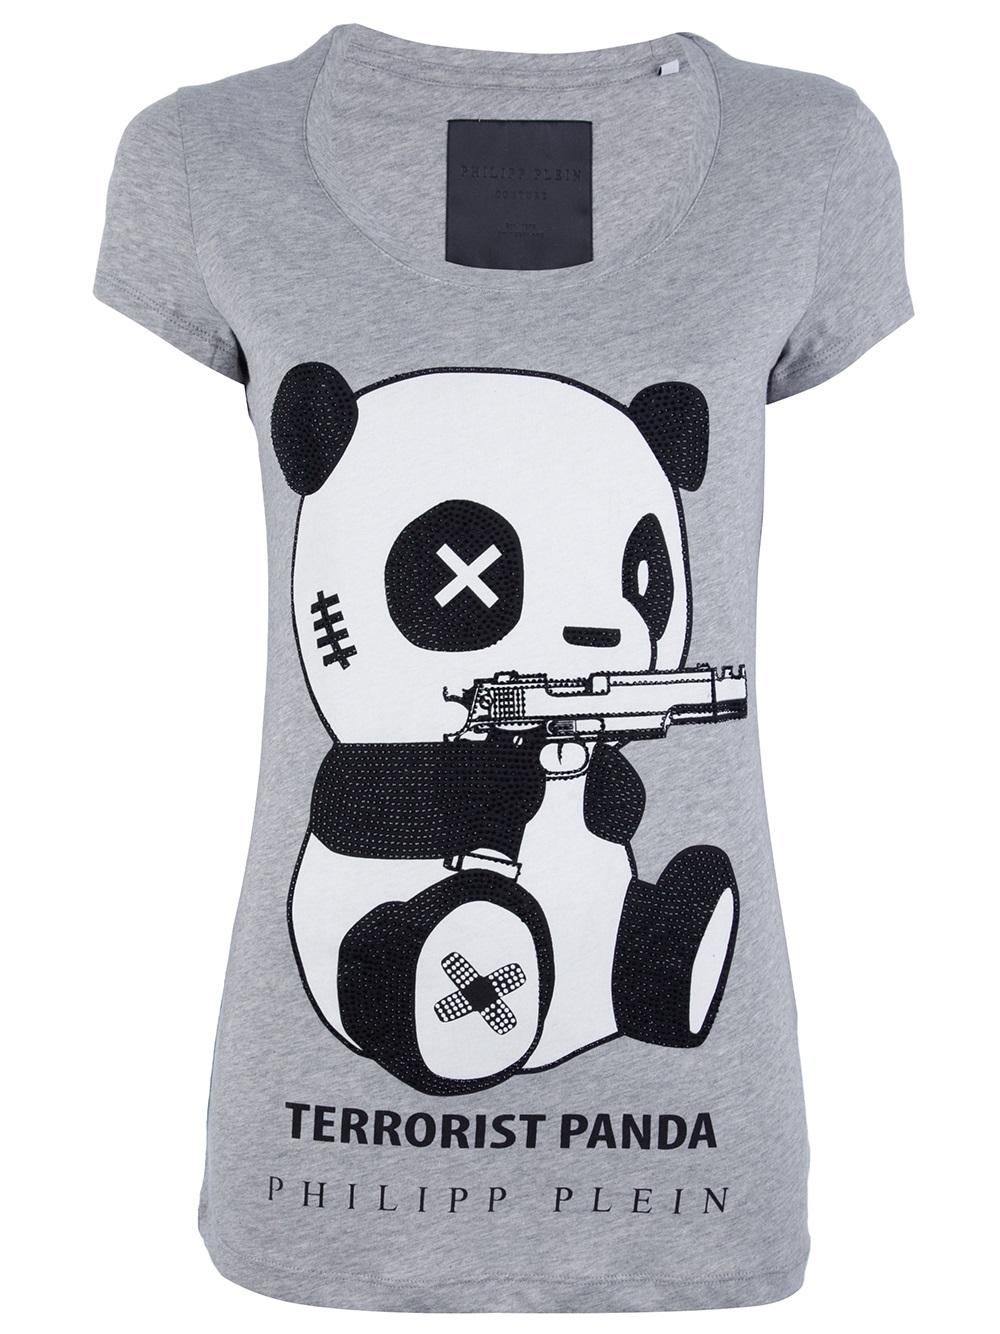 lyst philipp plein terrorist panda tshirt in black. Black Bedroom Furniture Sets. Home Design Ideas